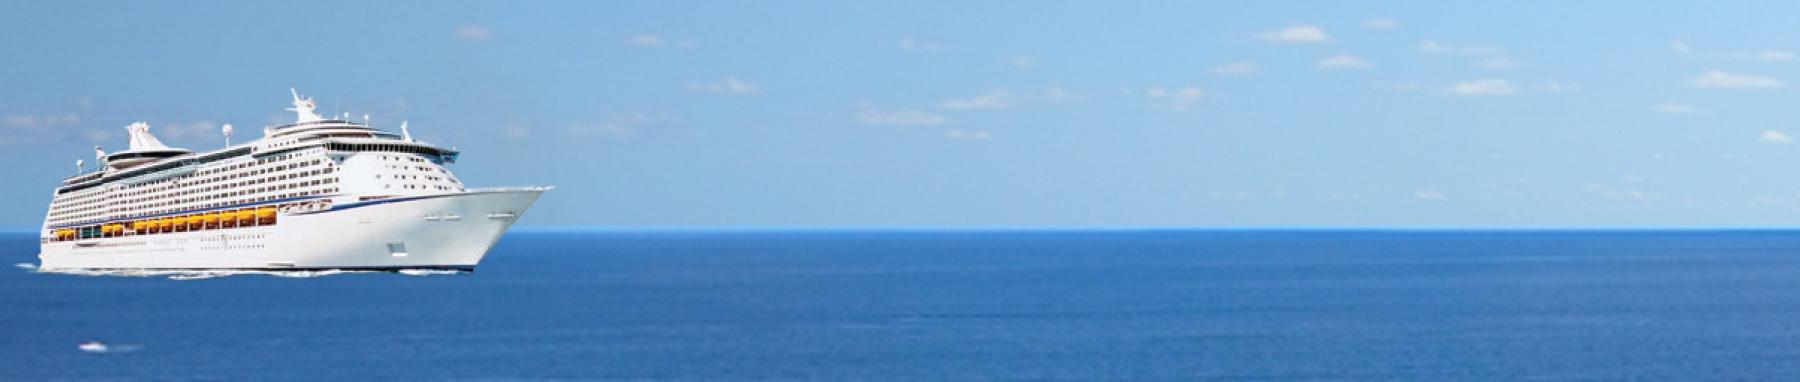 Royal Caribbean Cruises Harpers Travel Cheap Holiday